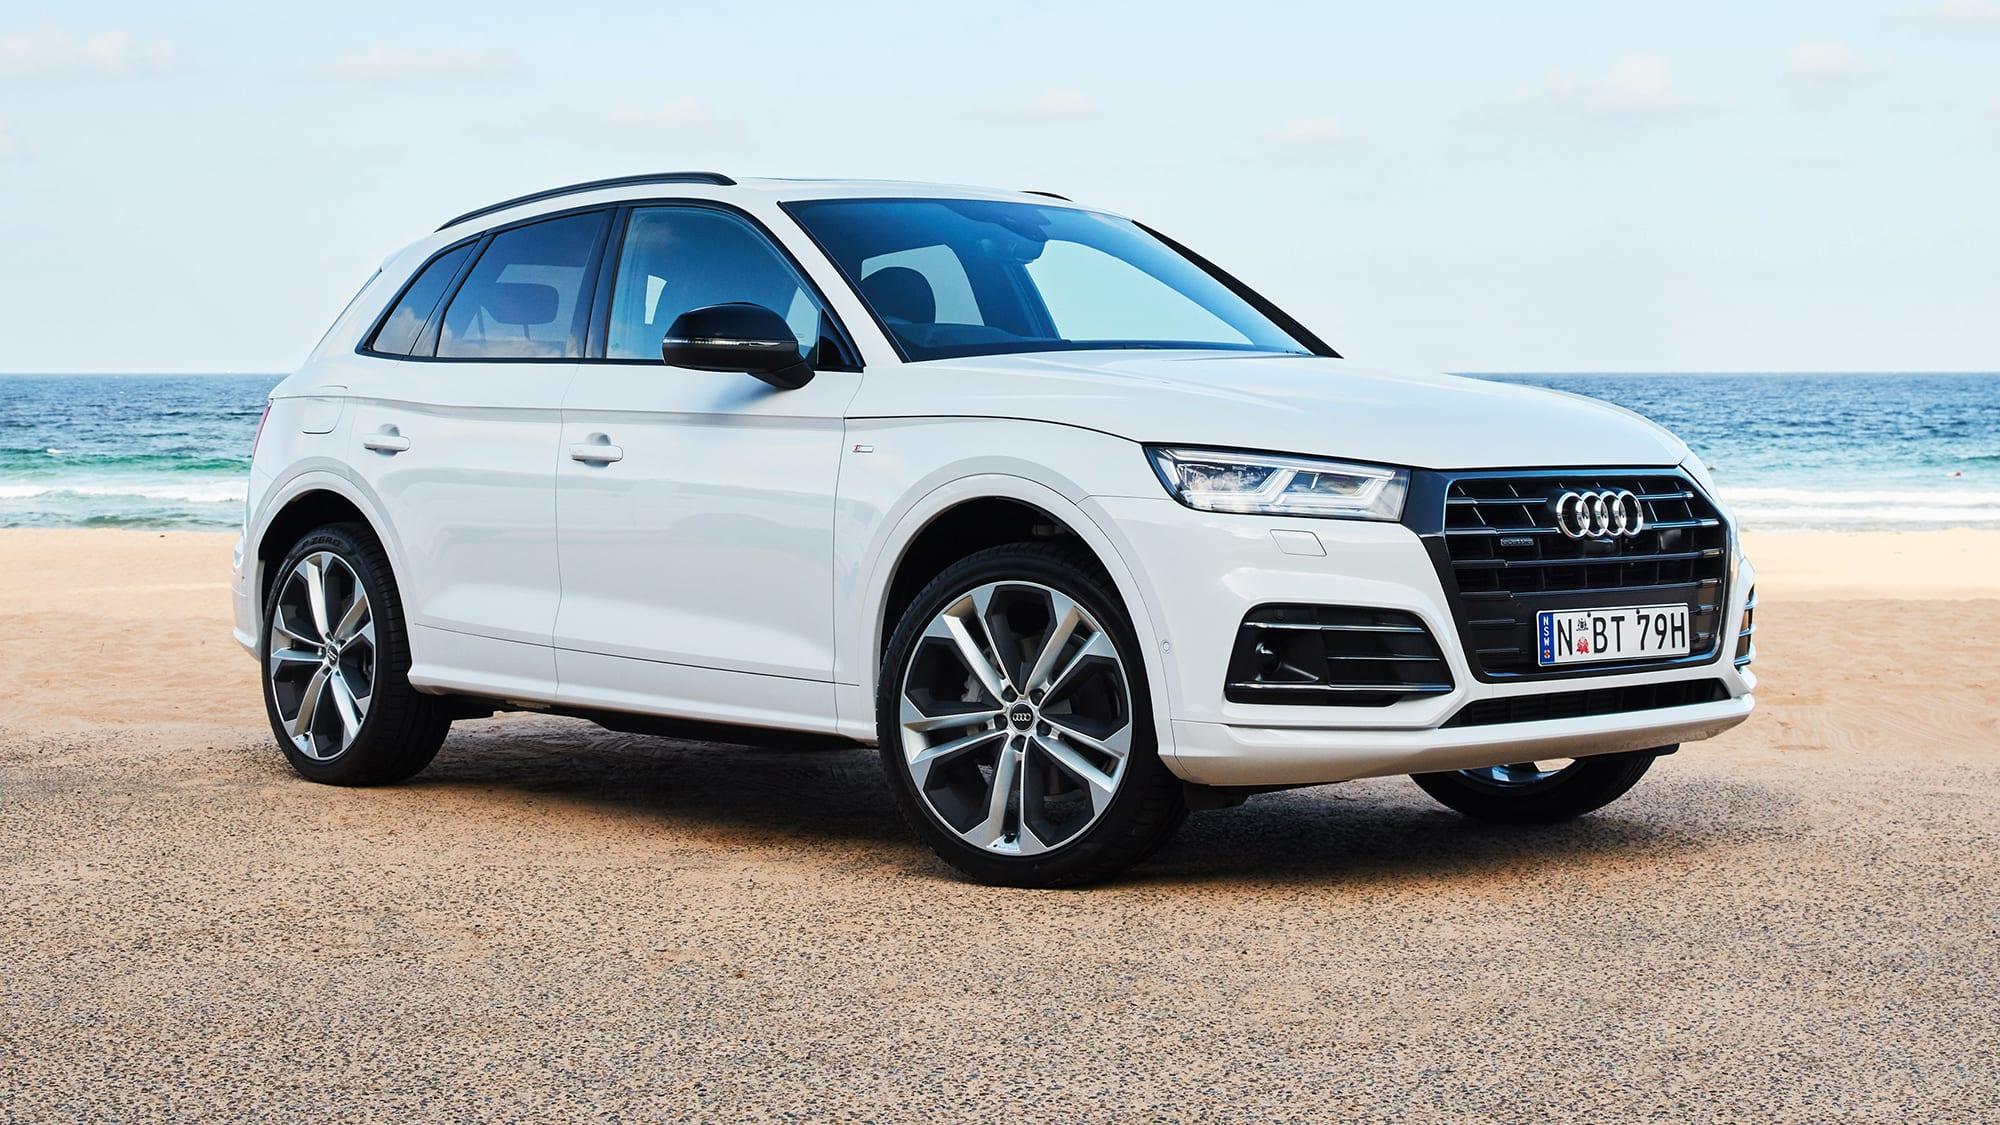 Kelebihan Kekurangan Audi Q5 Review